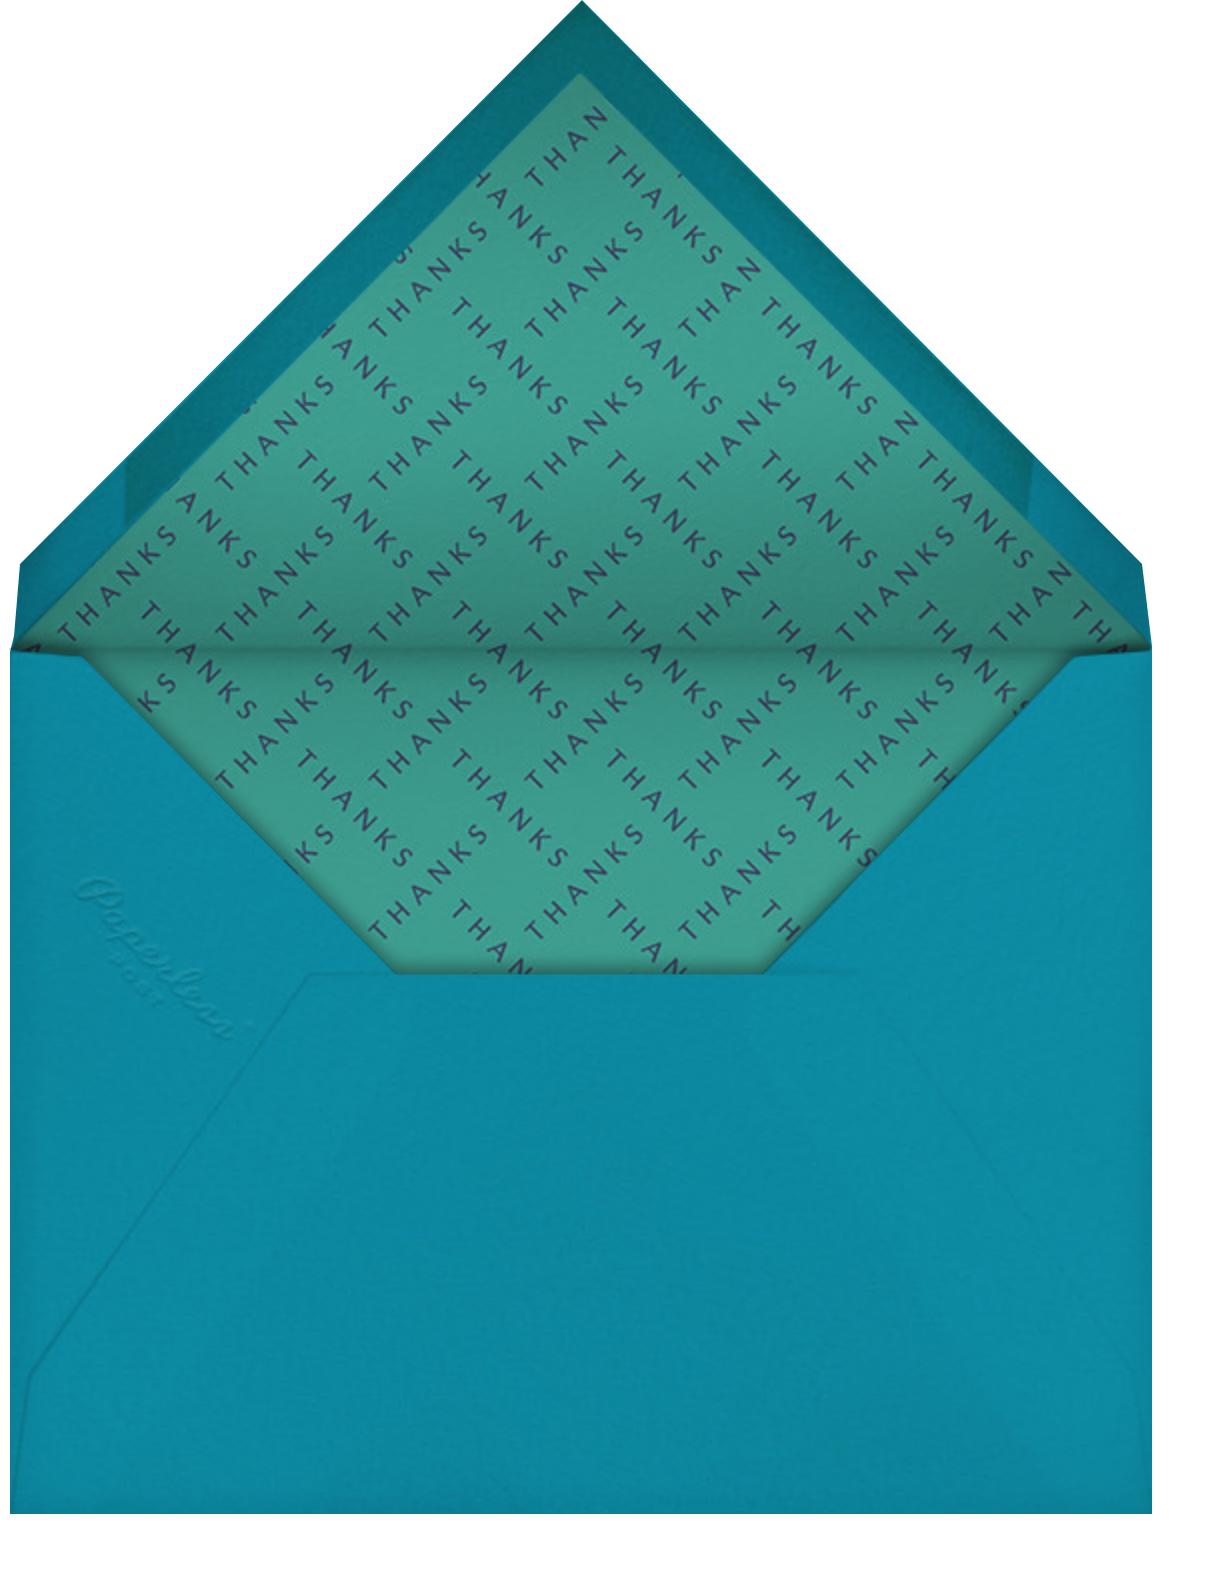 Applause - Paperless Post - Envelope